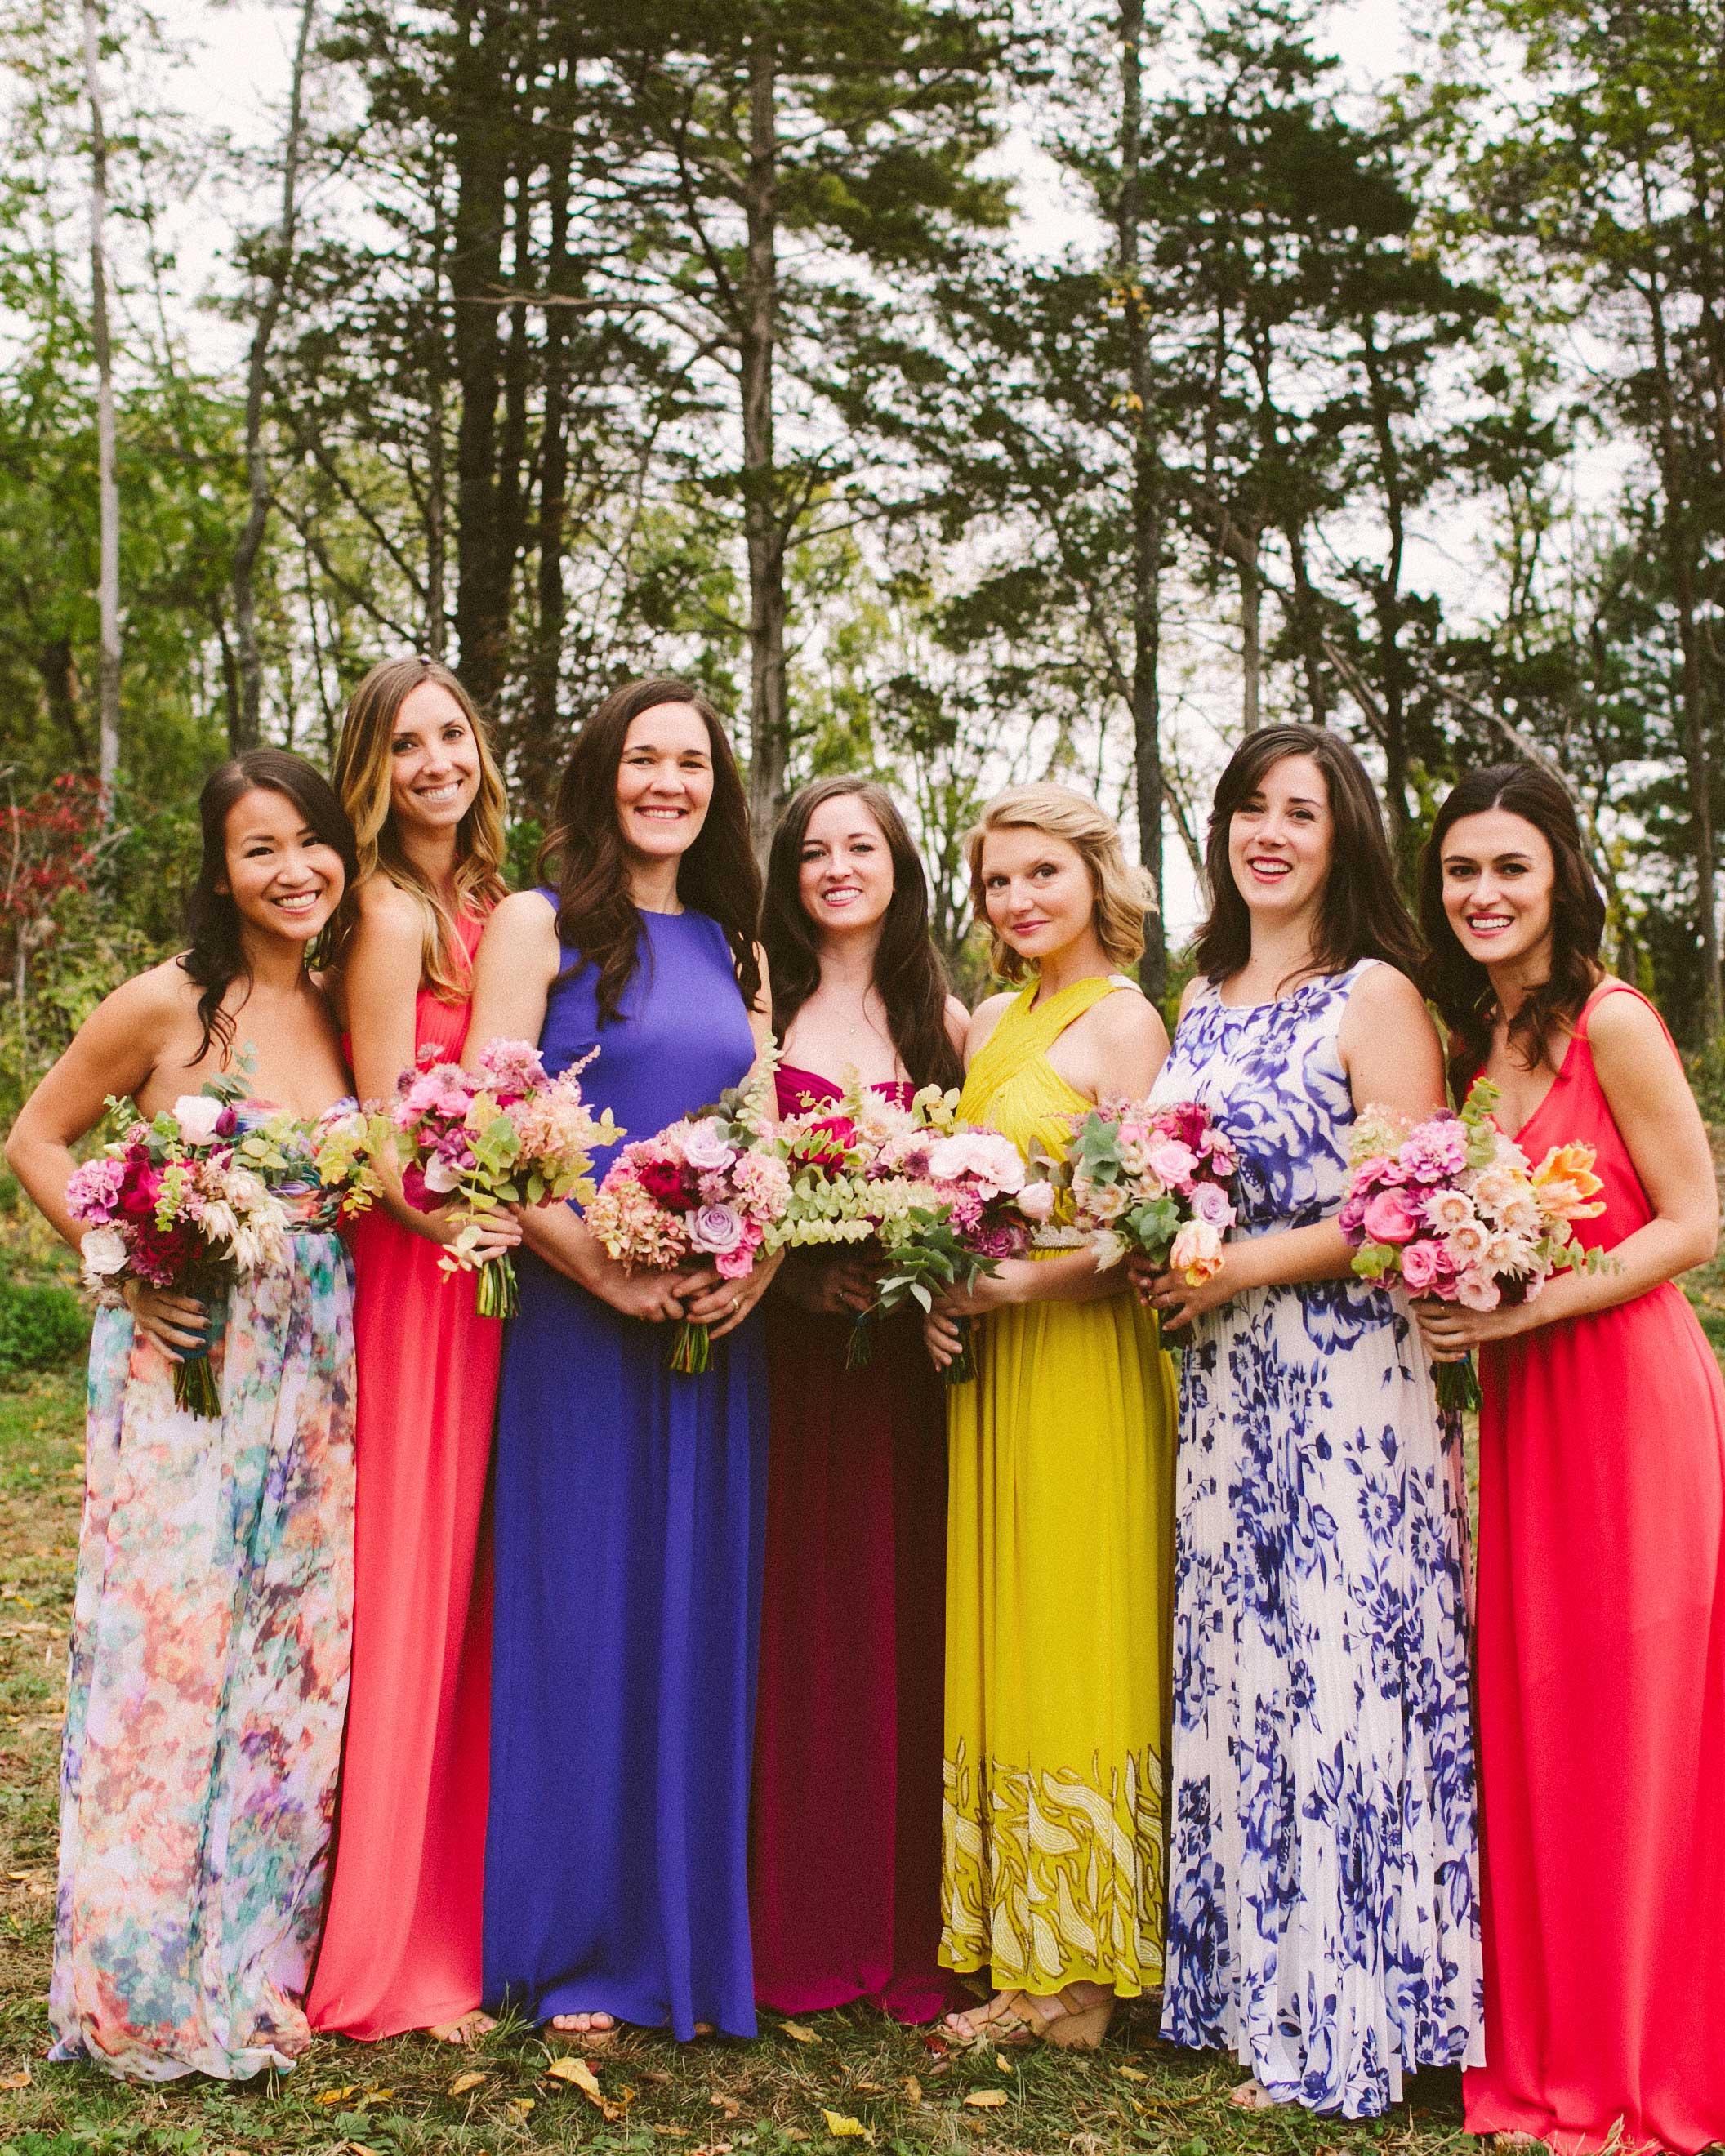 alisa-barrett-wedding-bridesmaids-254-s113048-0716.jpg